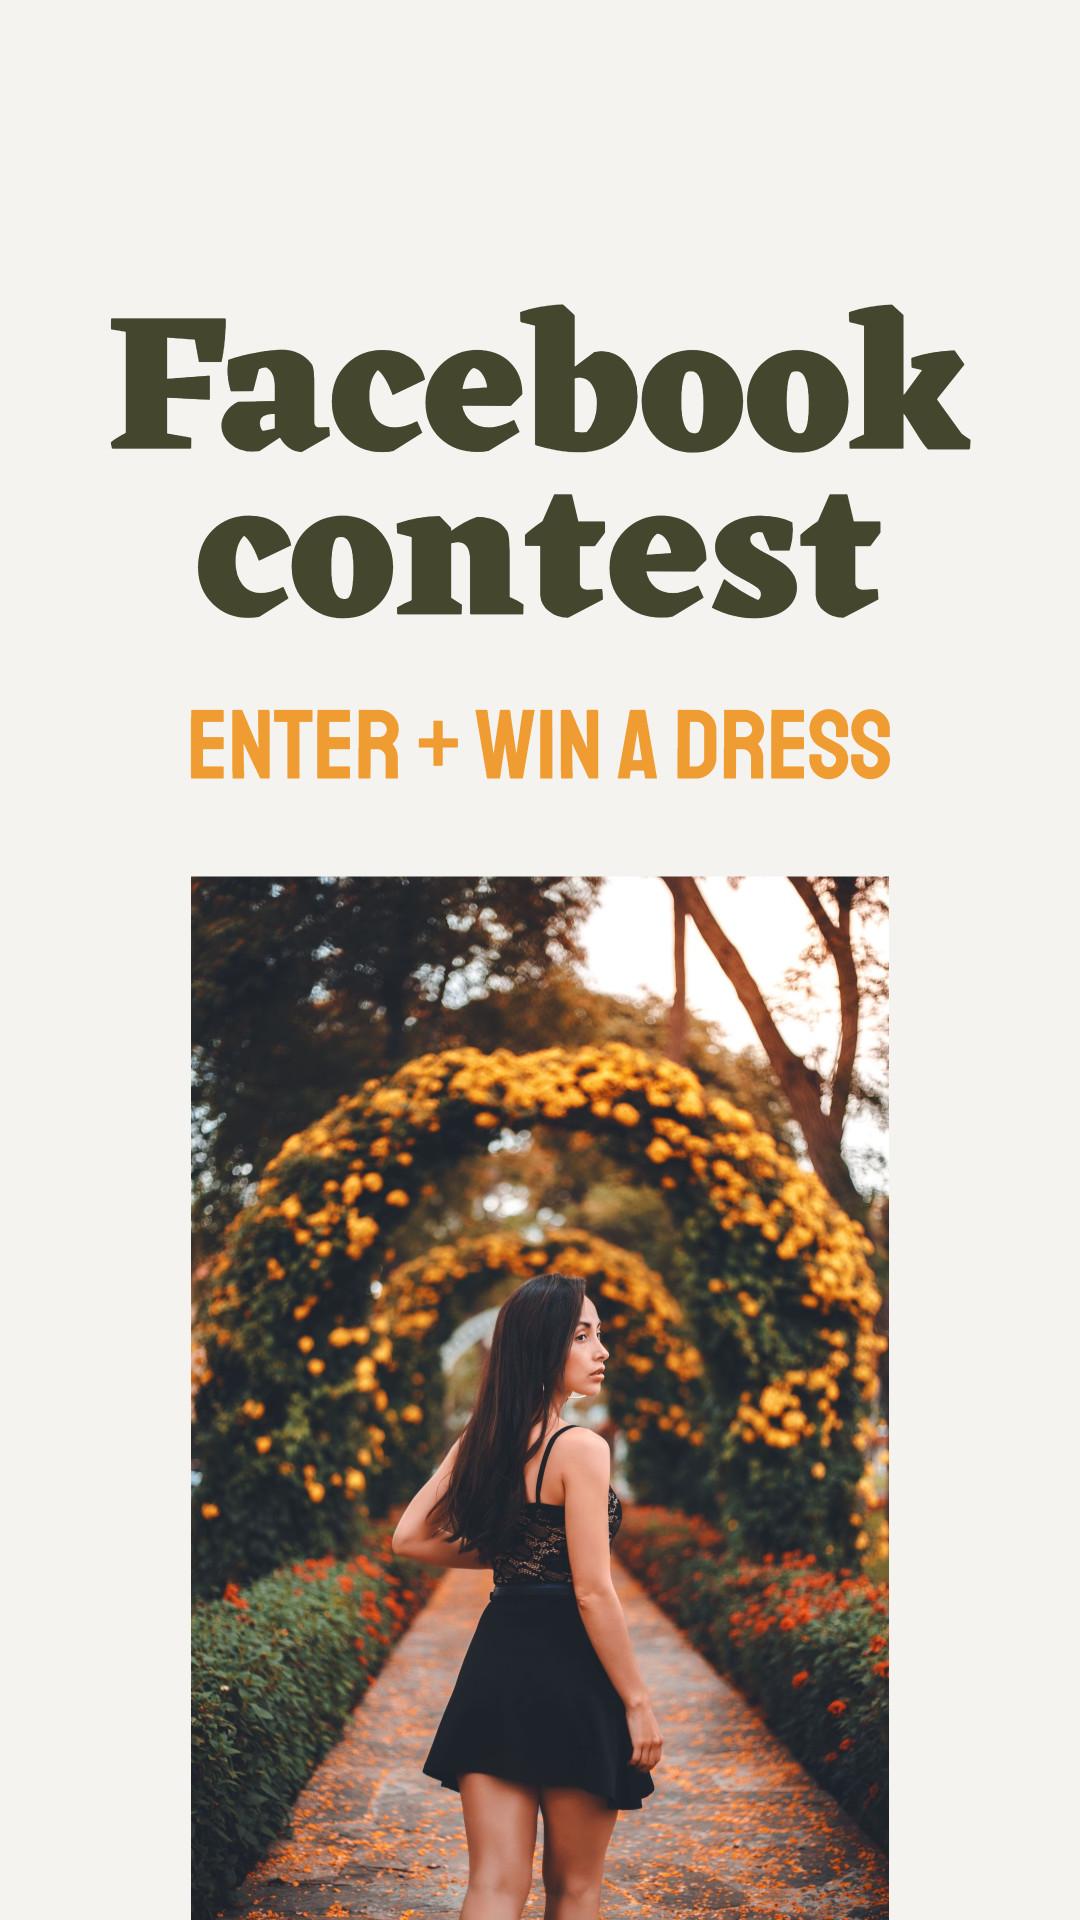 Facebook contest - enter and win - social media template